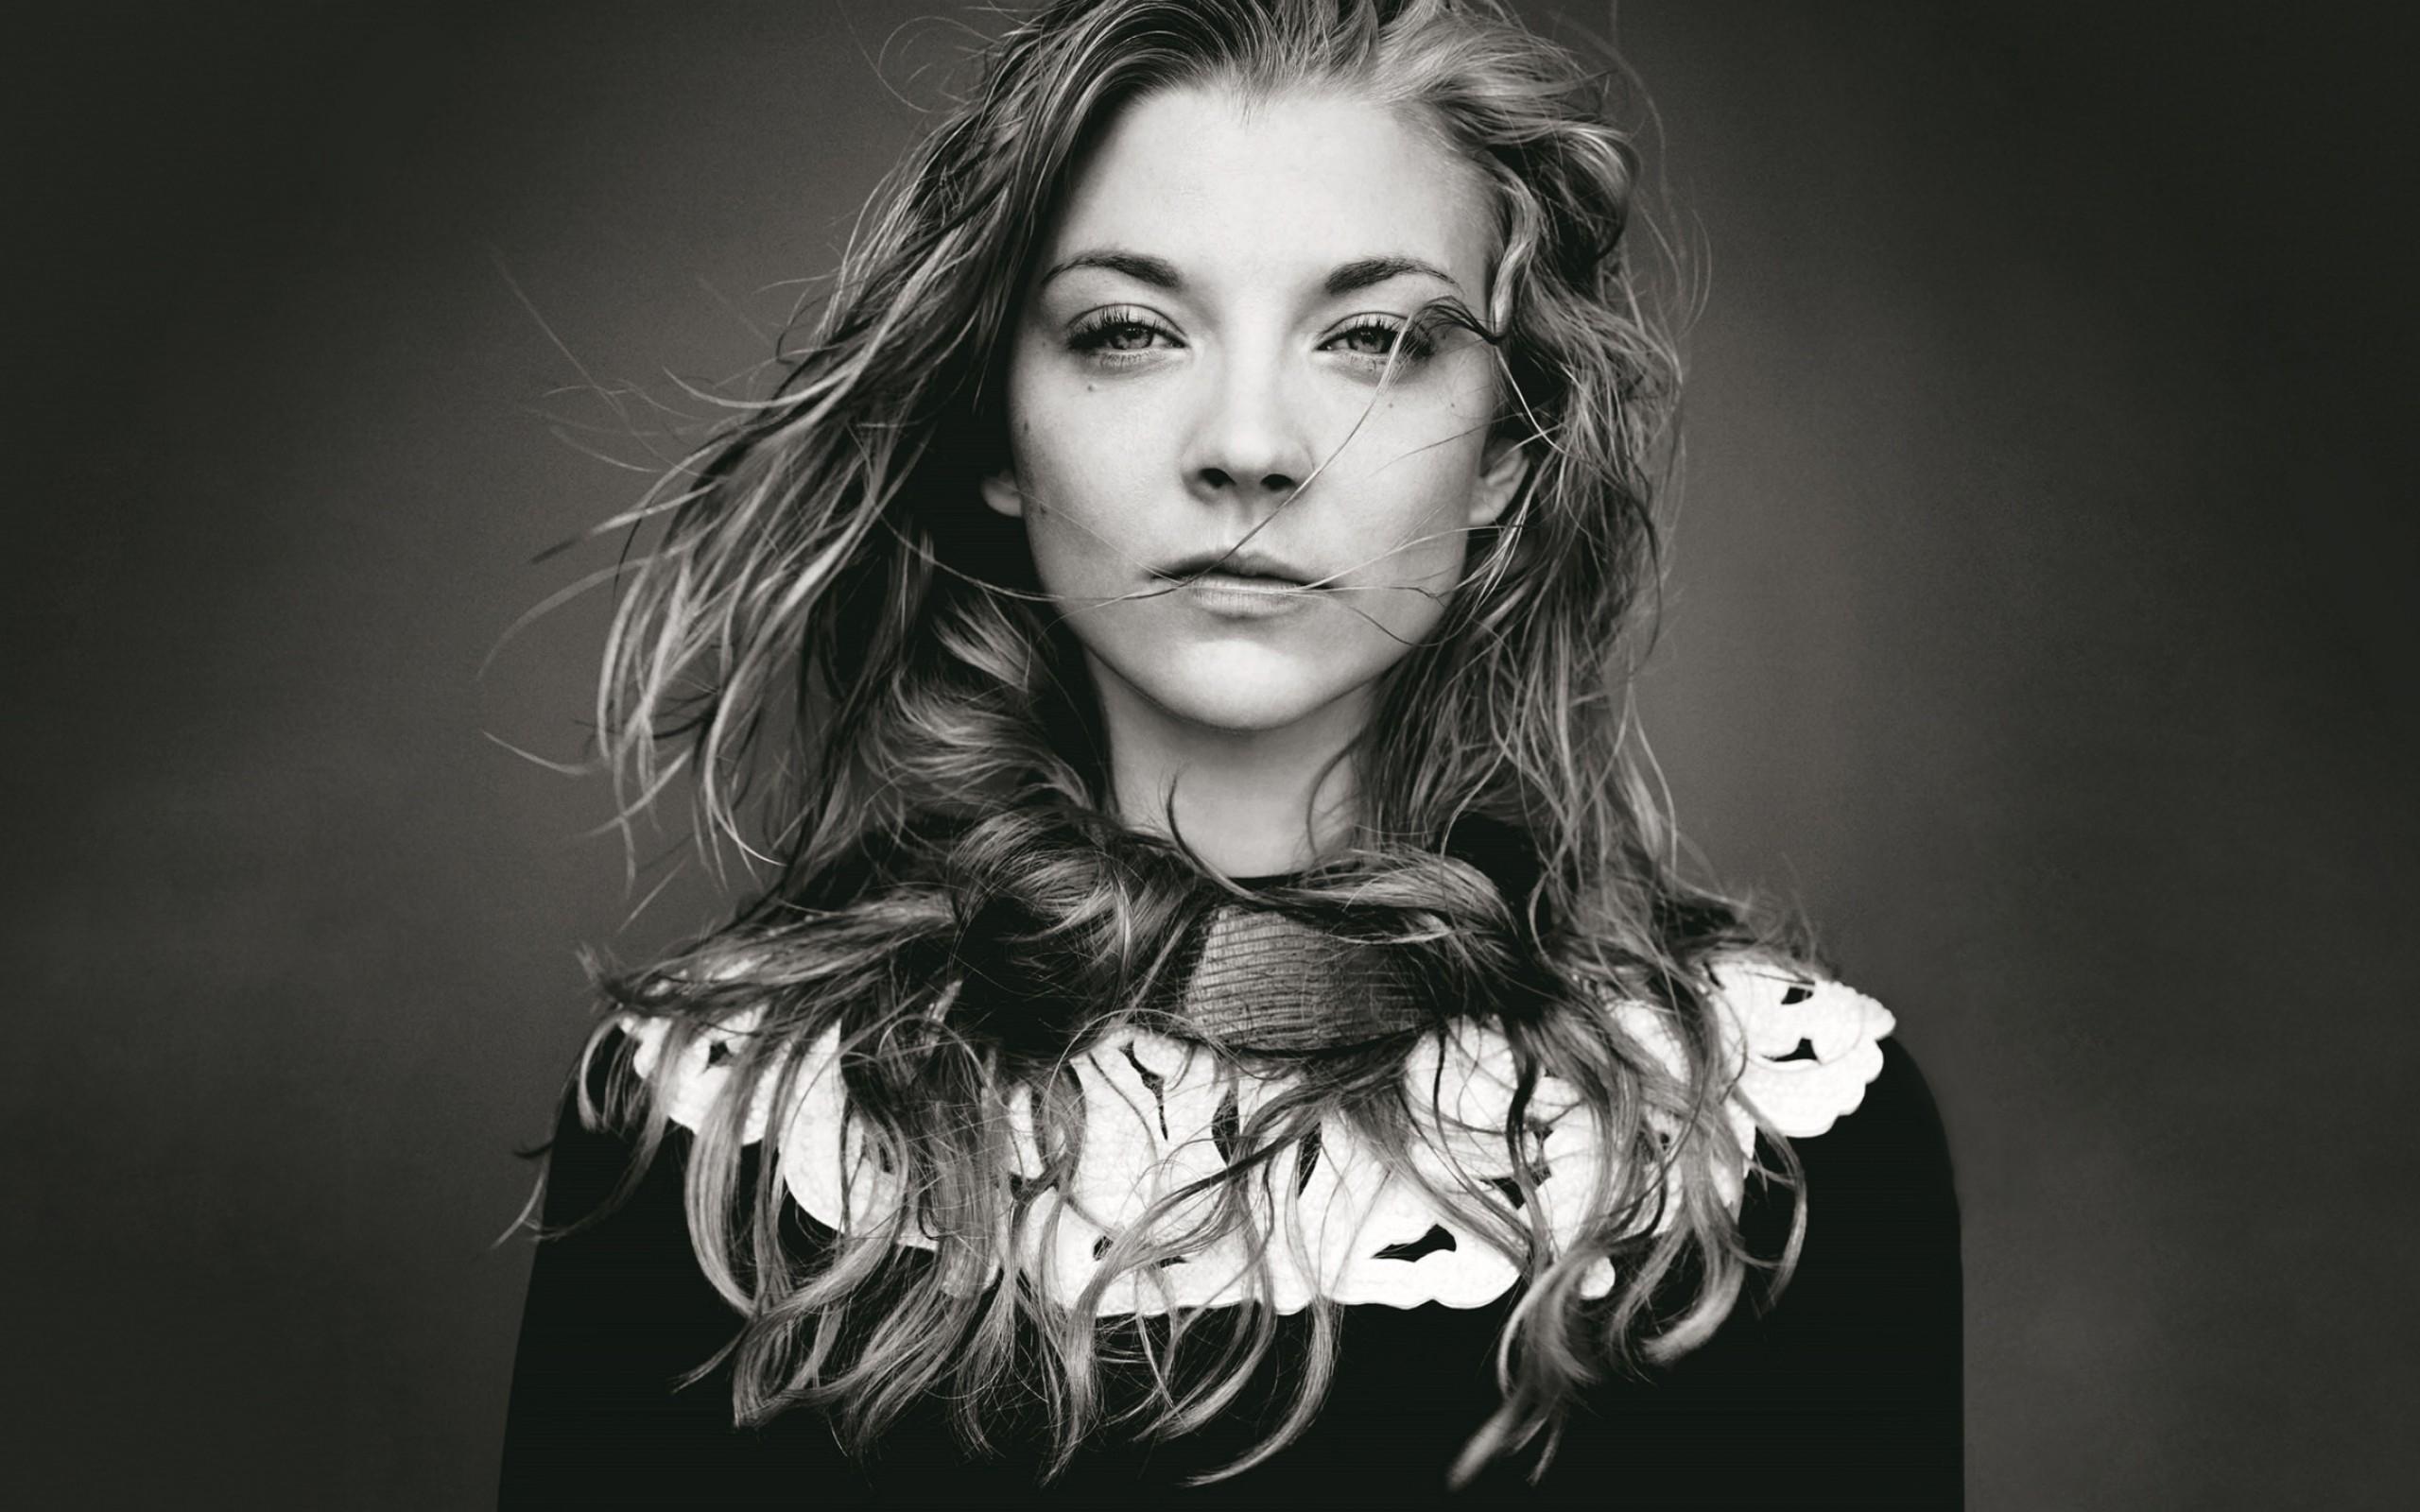 Natalie Dormer Monochrome, HD Celebrities, 4k Wallpapers ...